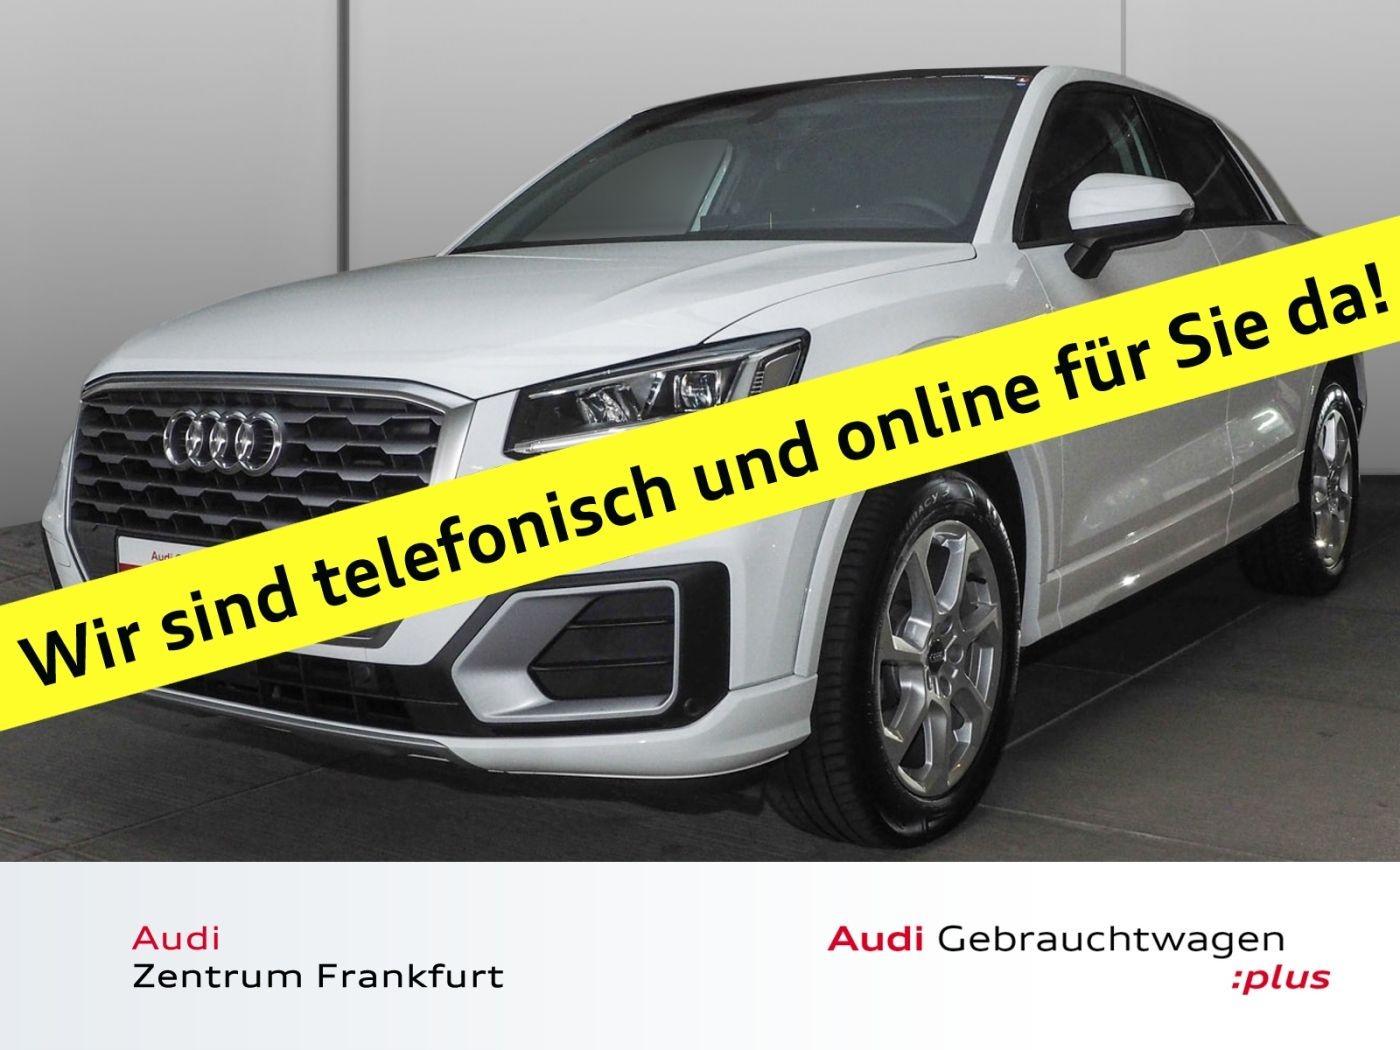 Audi Q2 1.0 TFSI sport Navi VirtualCockpit Panorama LED PDC Sitzheizung Bluetooth, Jahr 2017, Benzin